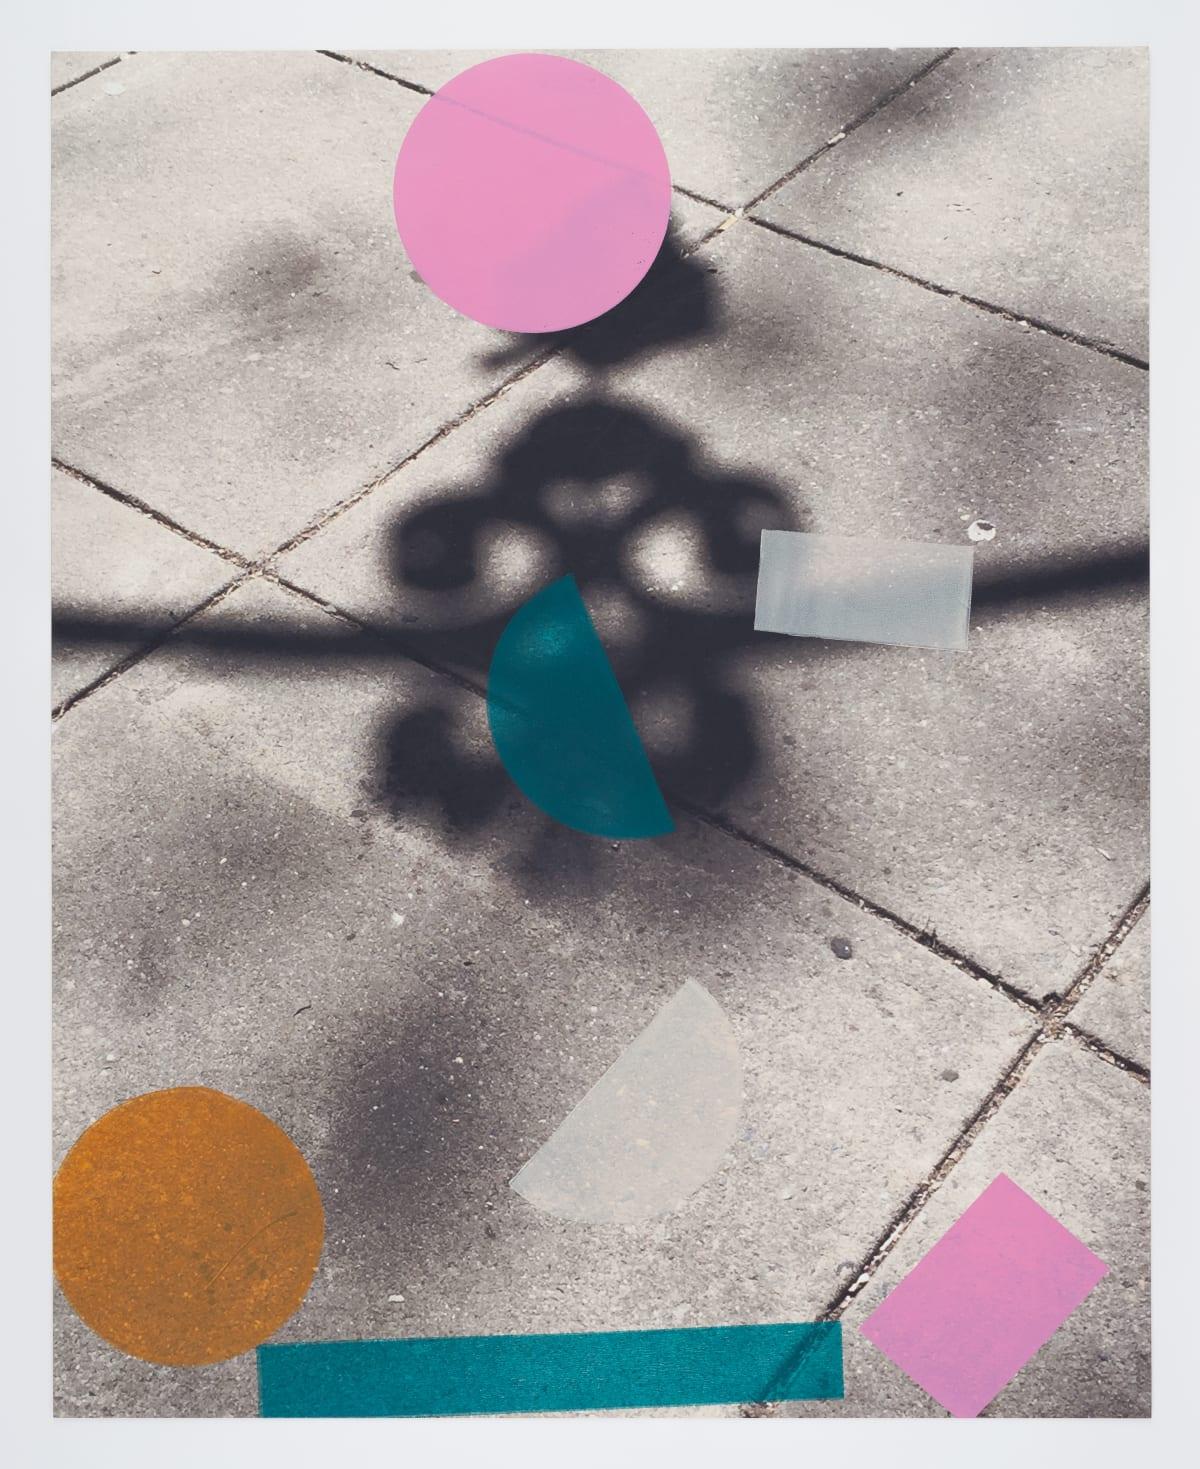 Austin Thomas, Dark and Light with Interruption, 2017